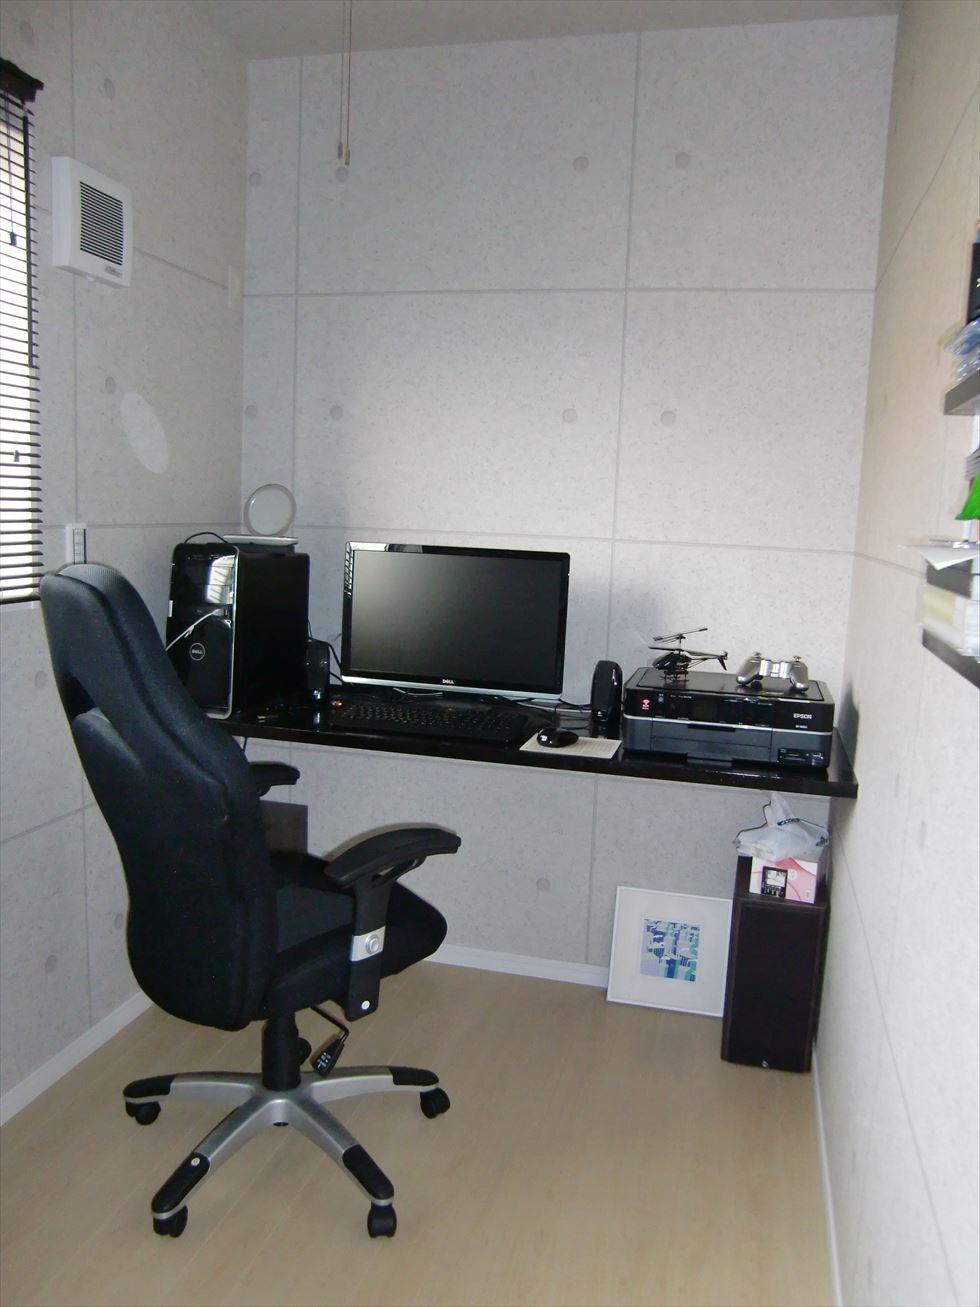 03-room39.jpg